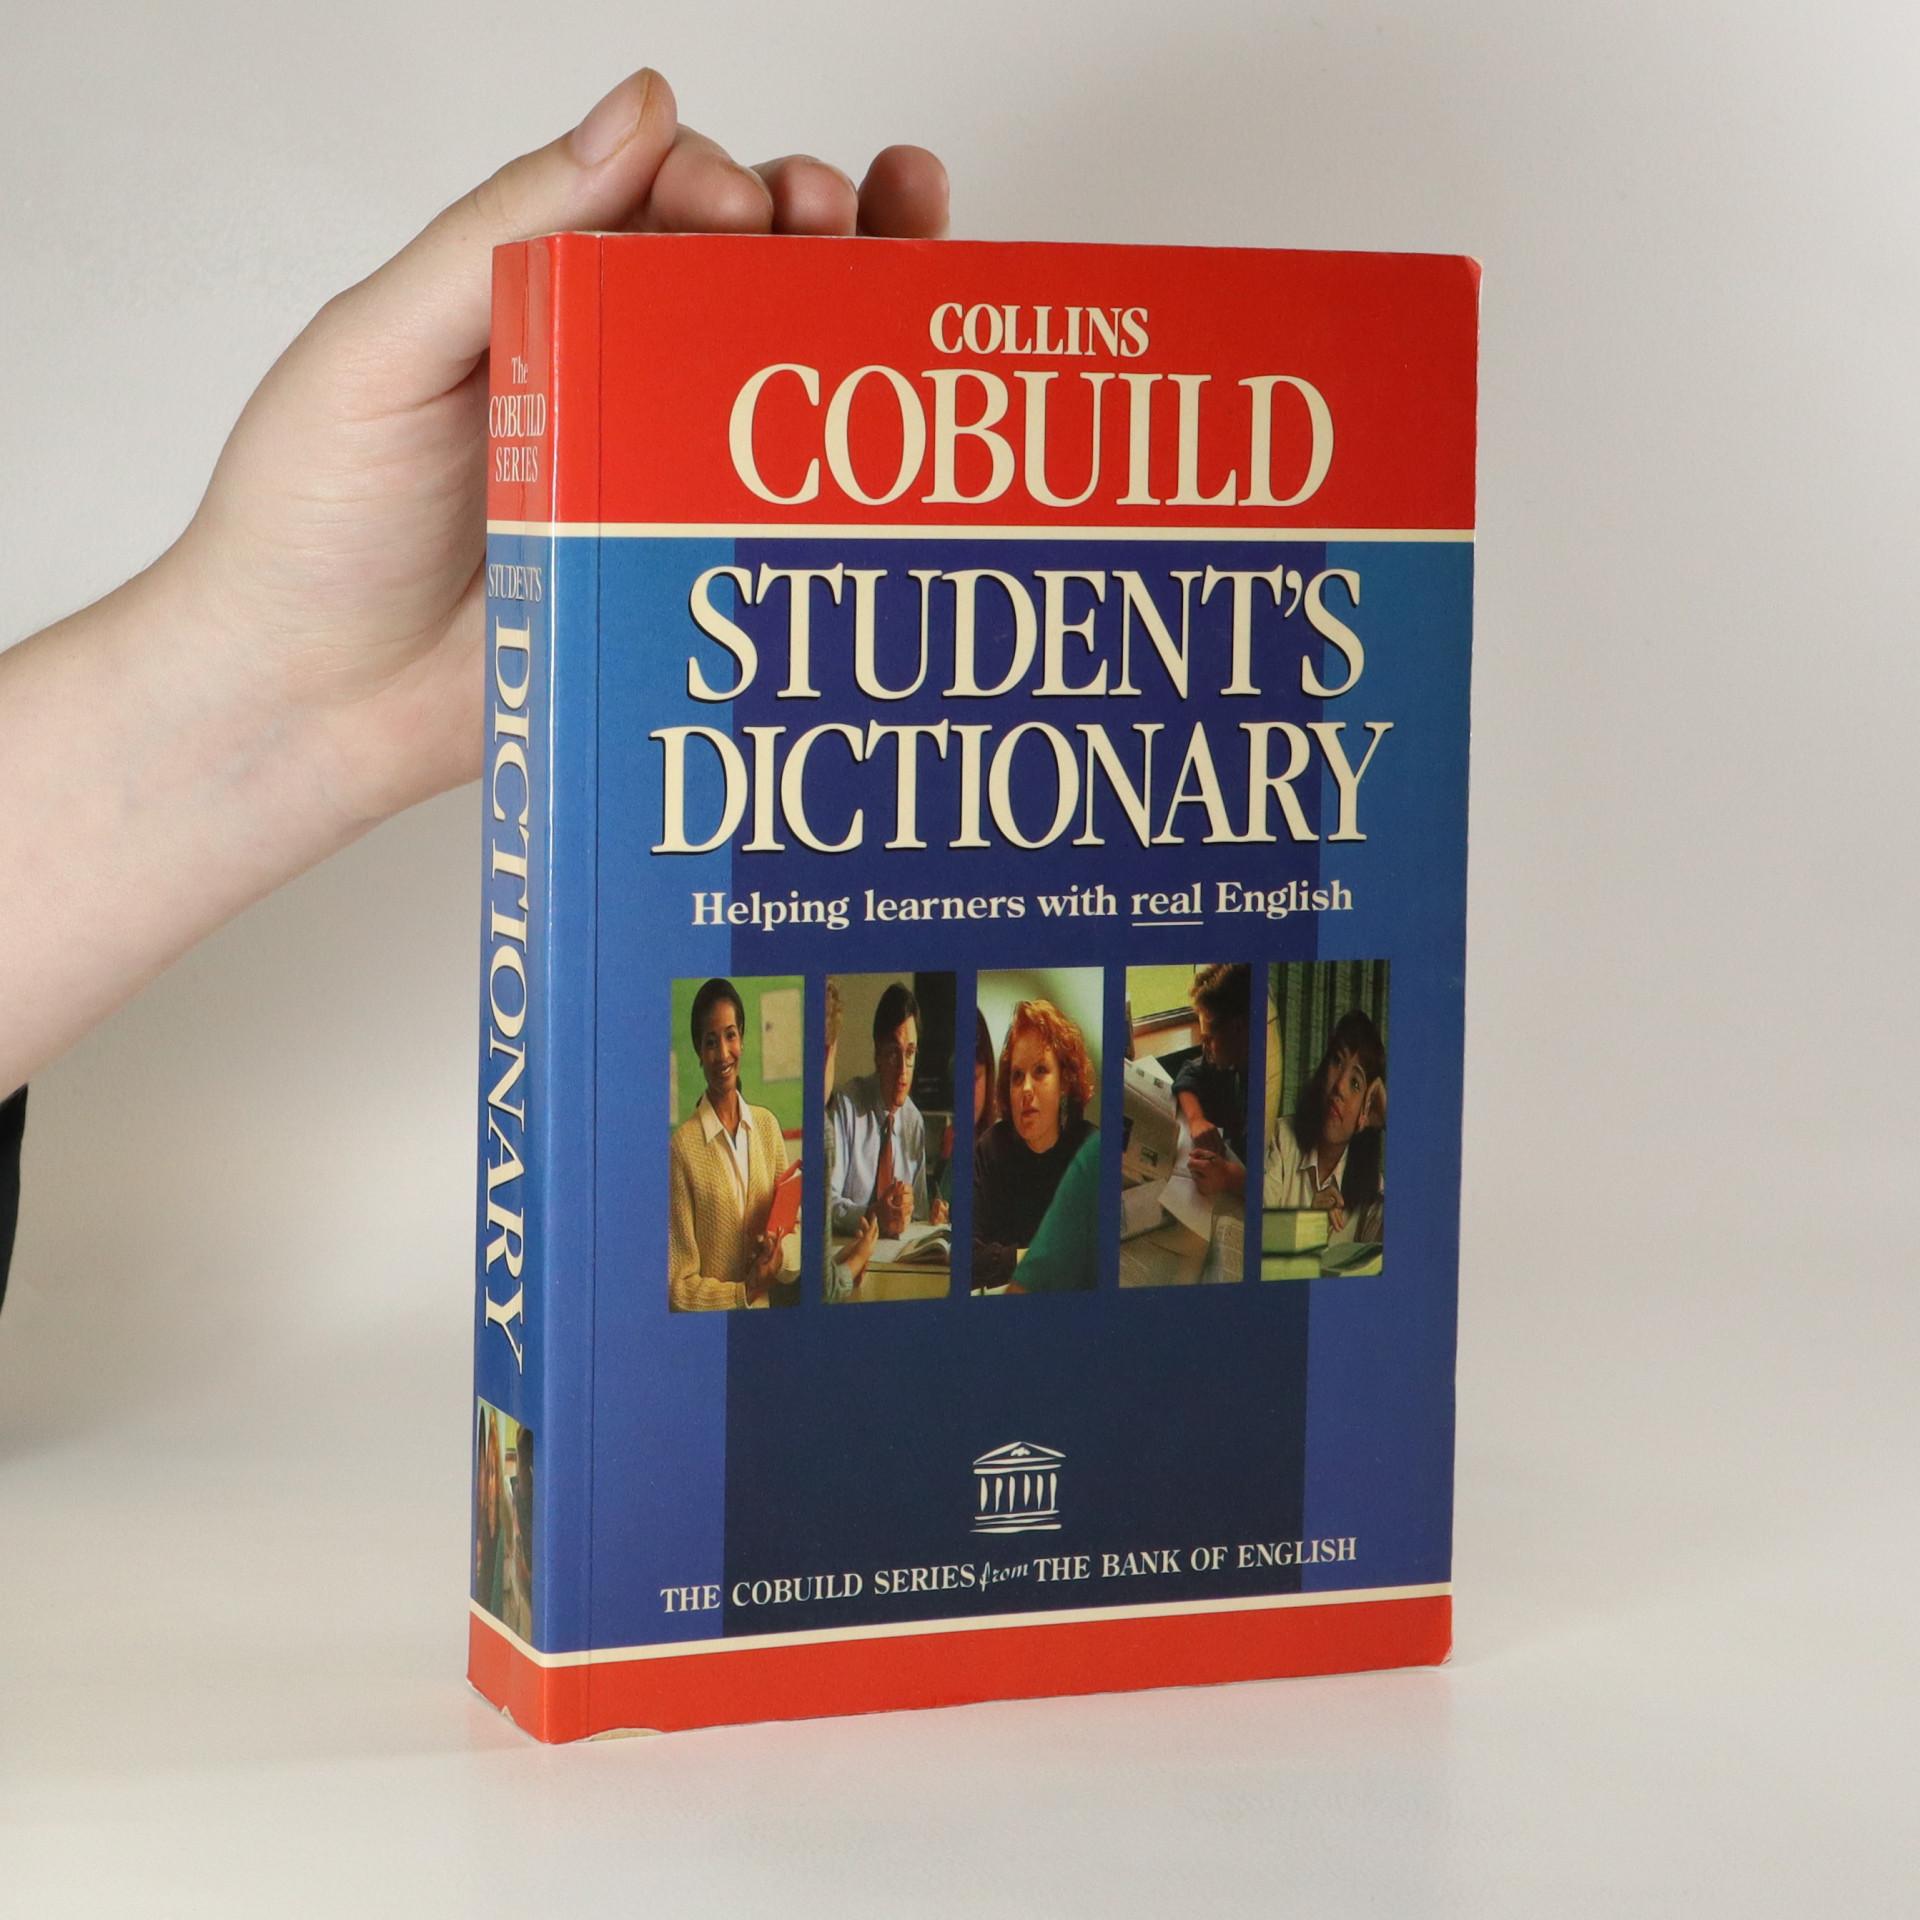 antikvární kniha Collins Cobuild Student's Dictionary, 1995